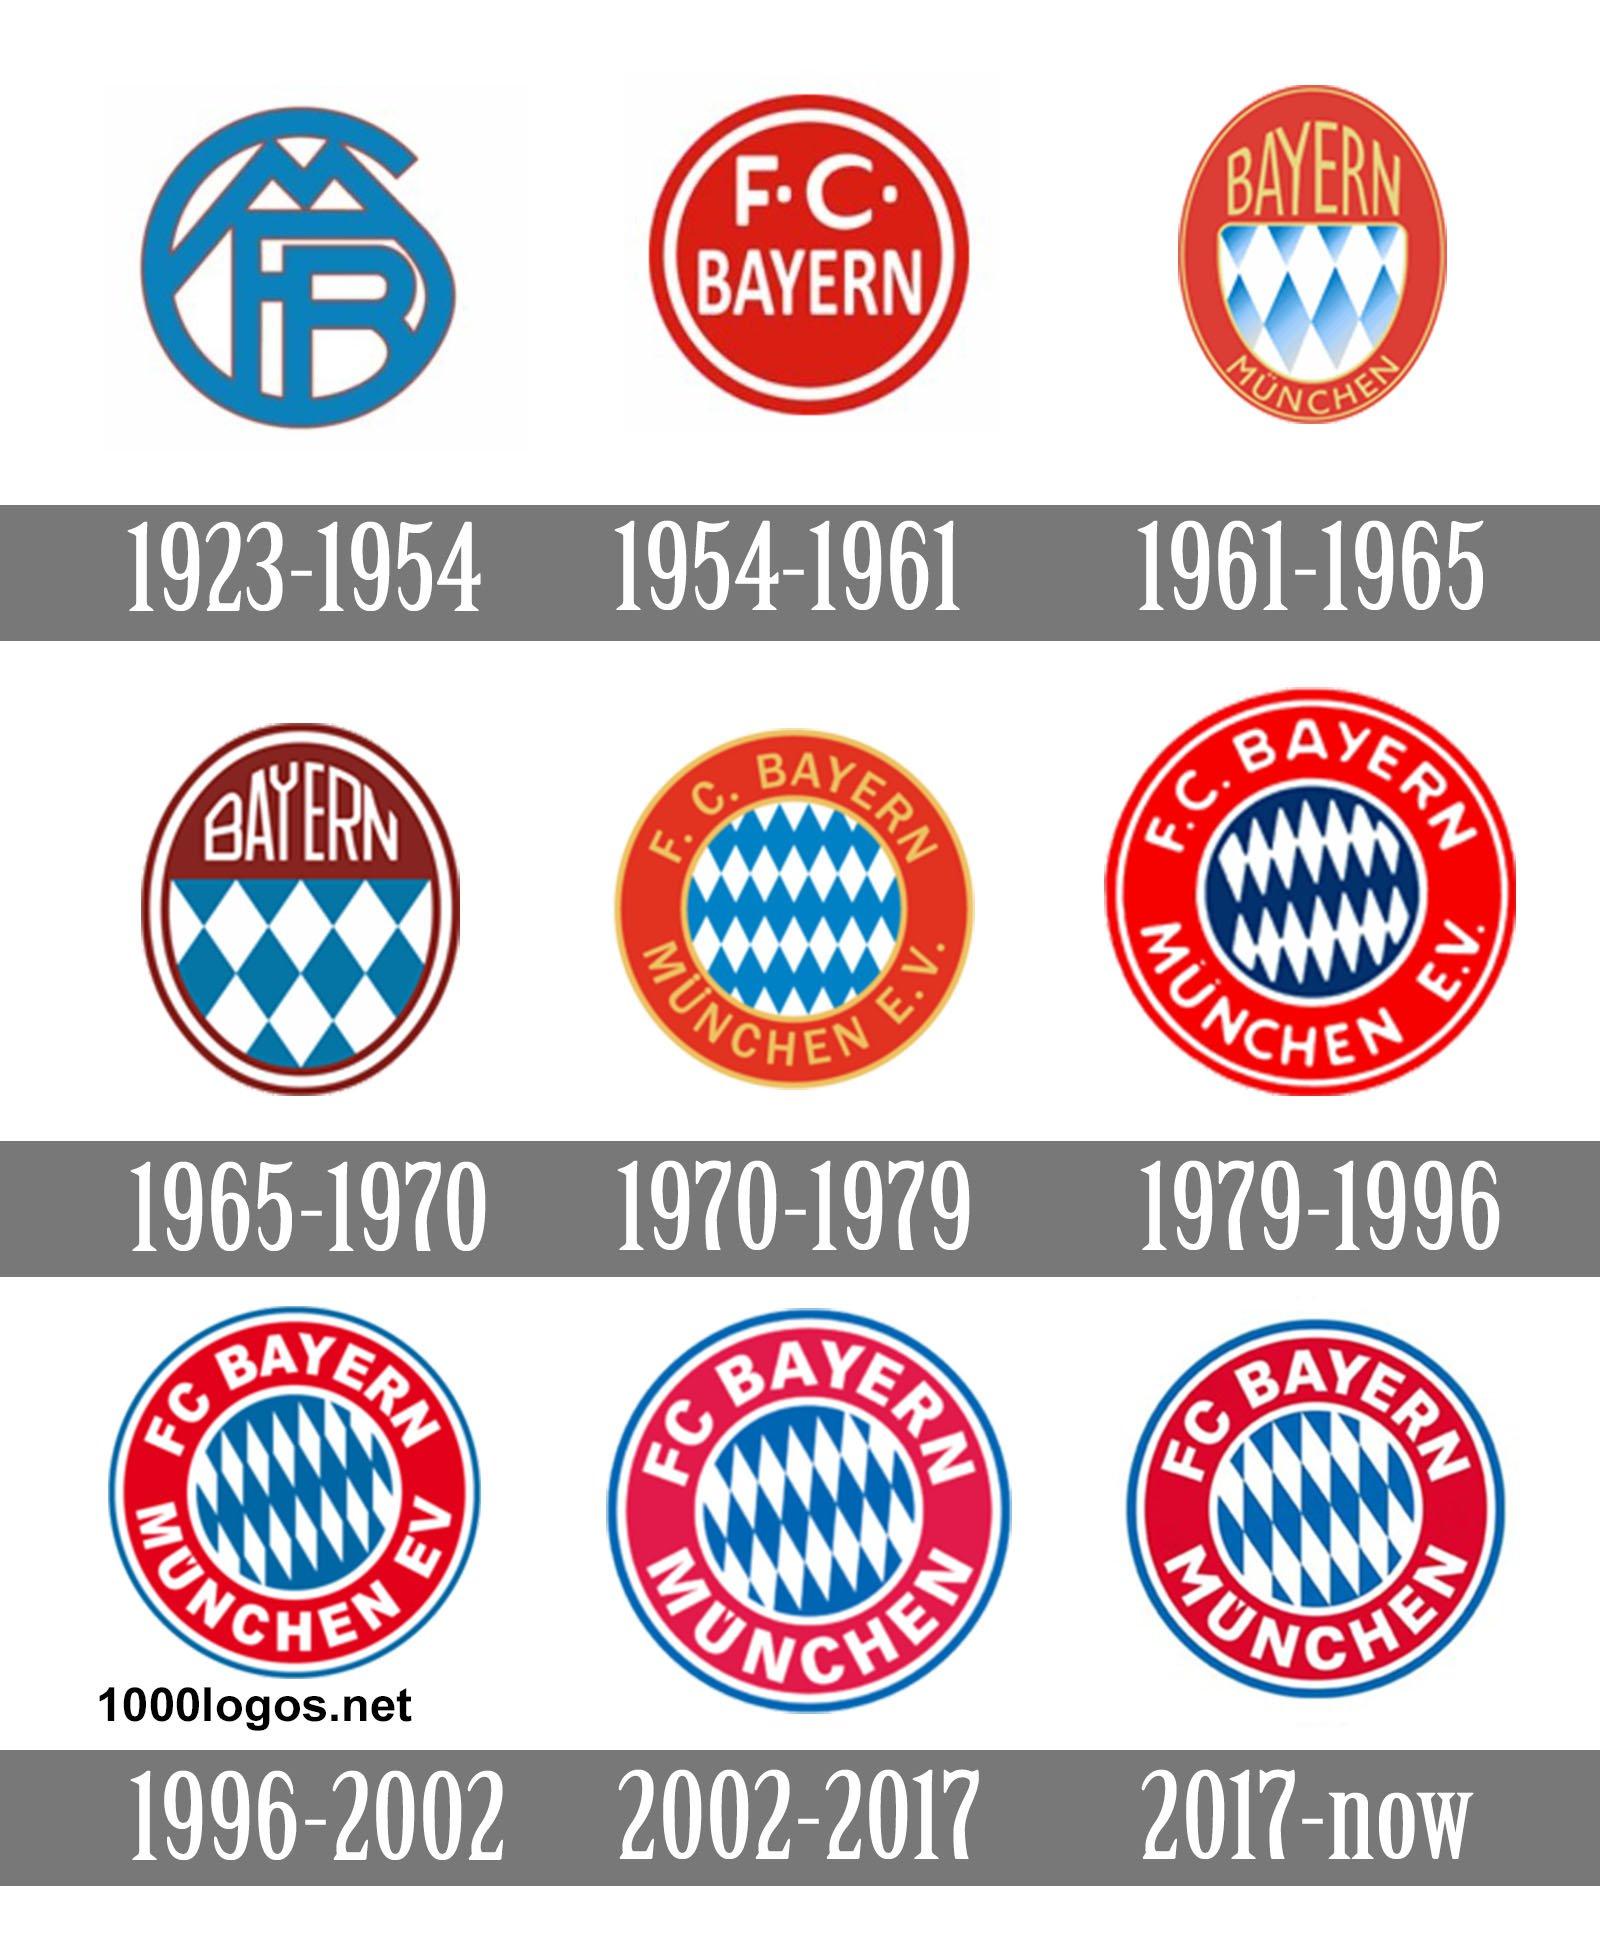 Bayern Mnchen Logo Bayern Mnchen Symbol Meaning History And